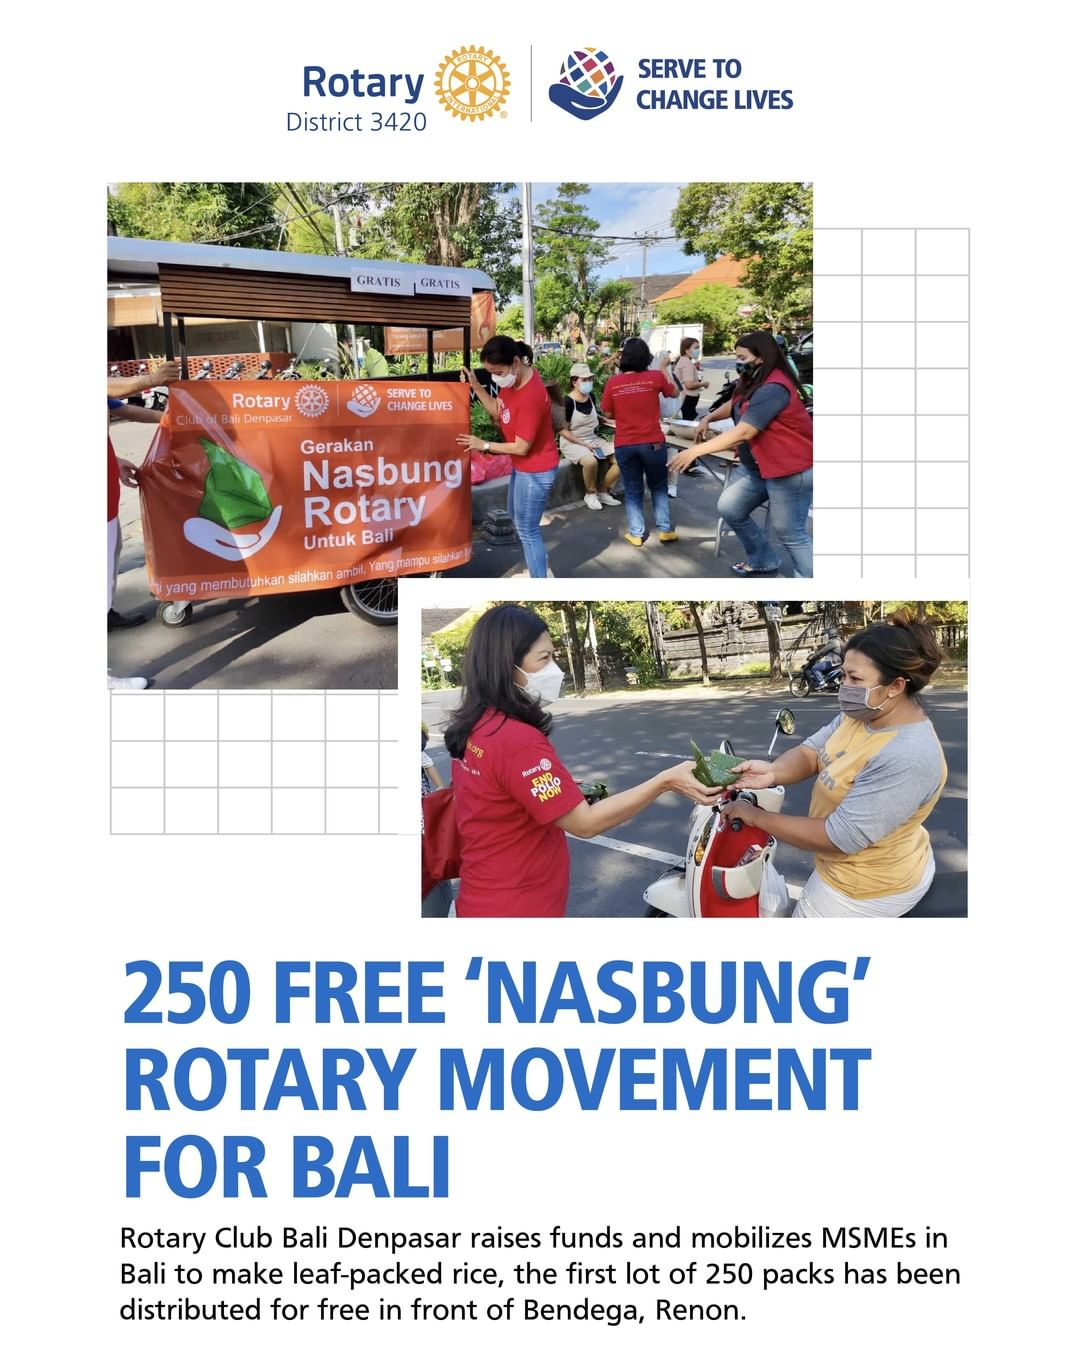 250 Free 'Nasbung' Rotary Movement for Bali